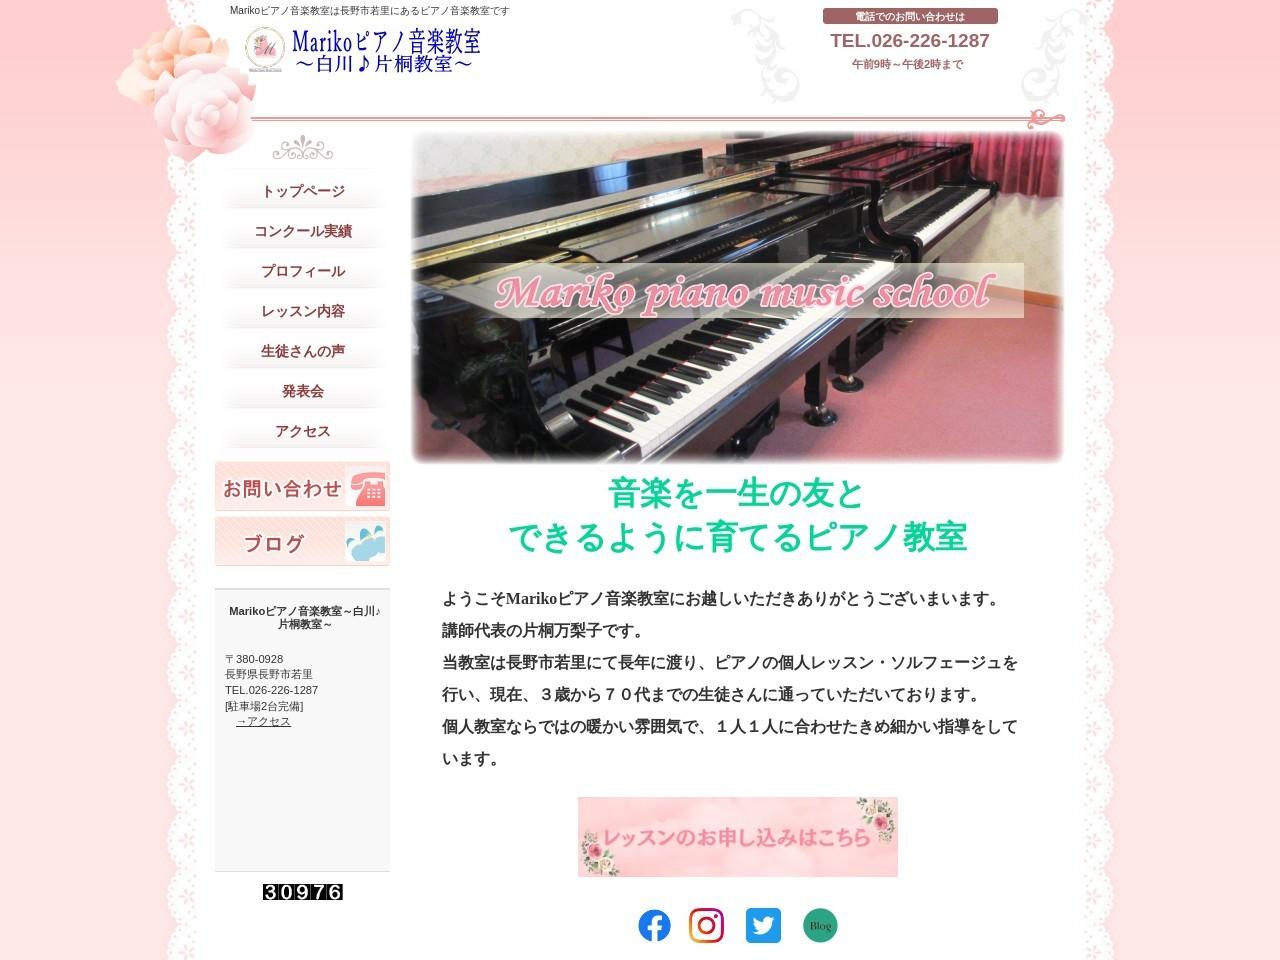 Marikoピアノ音楽教室のサムネイル